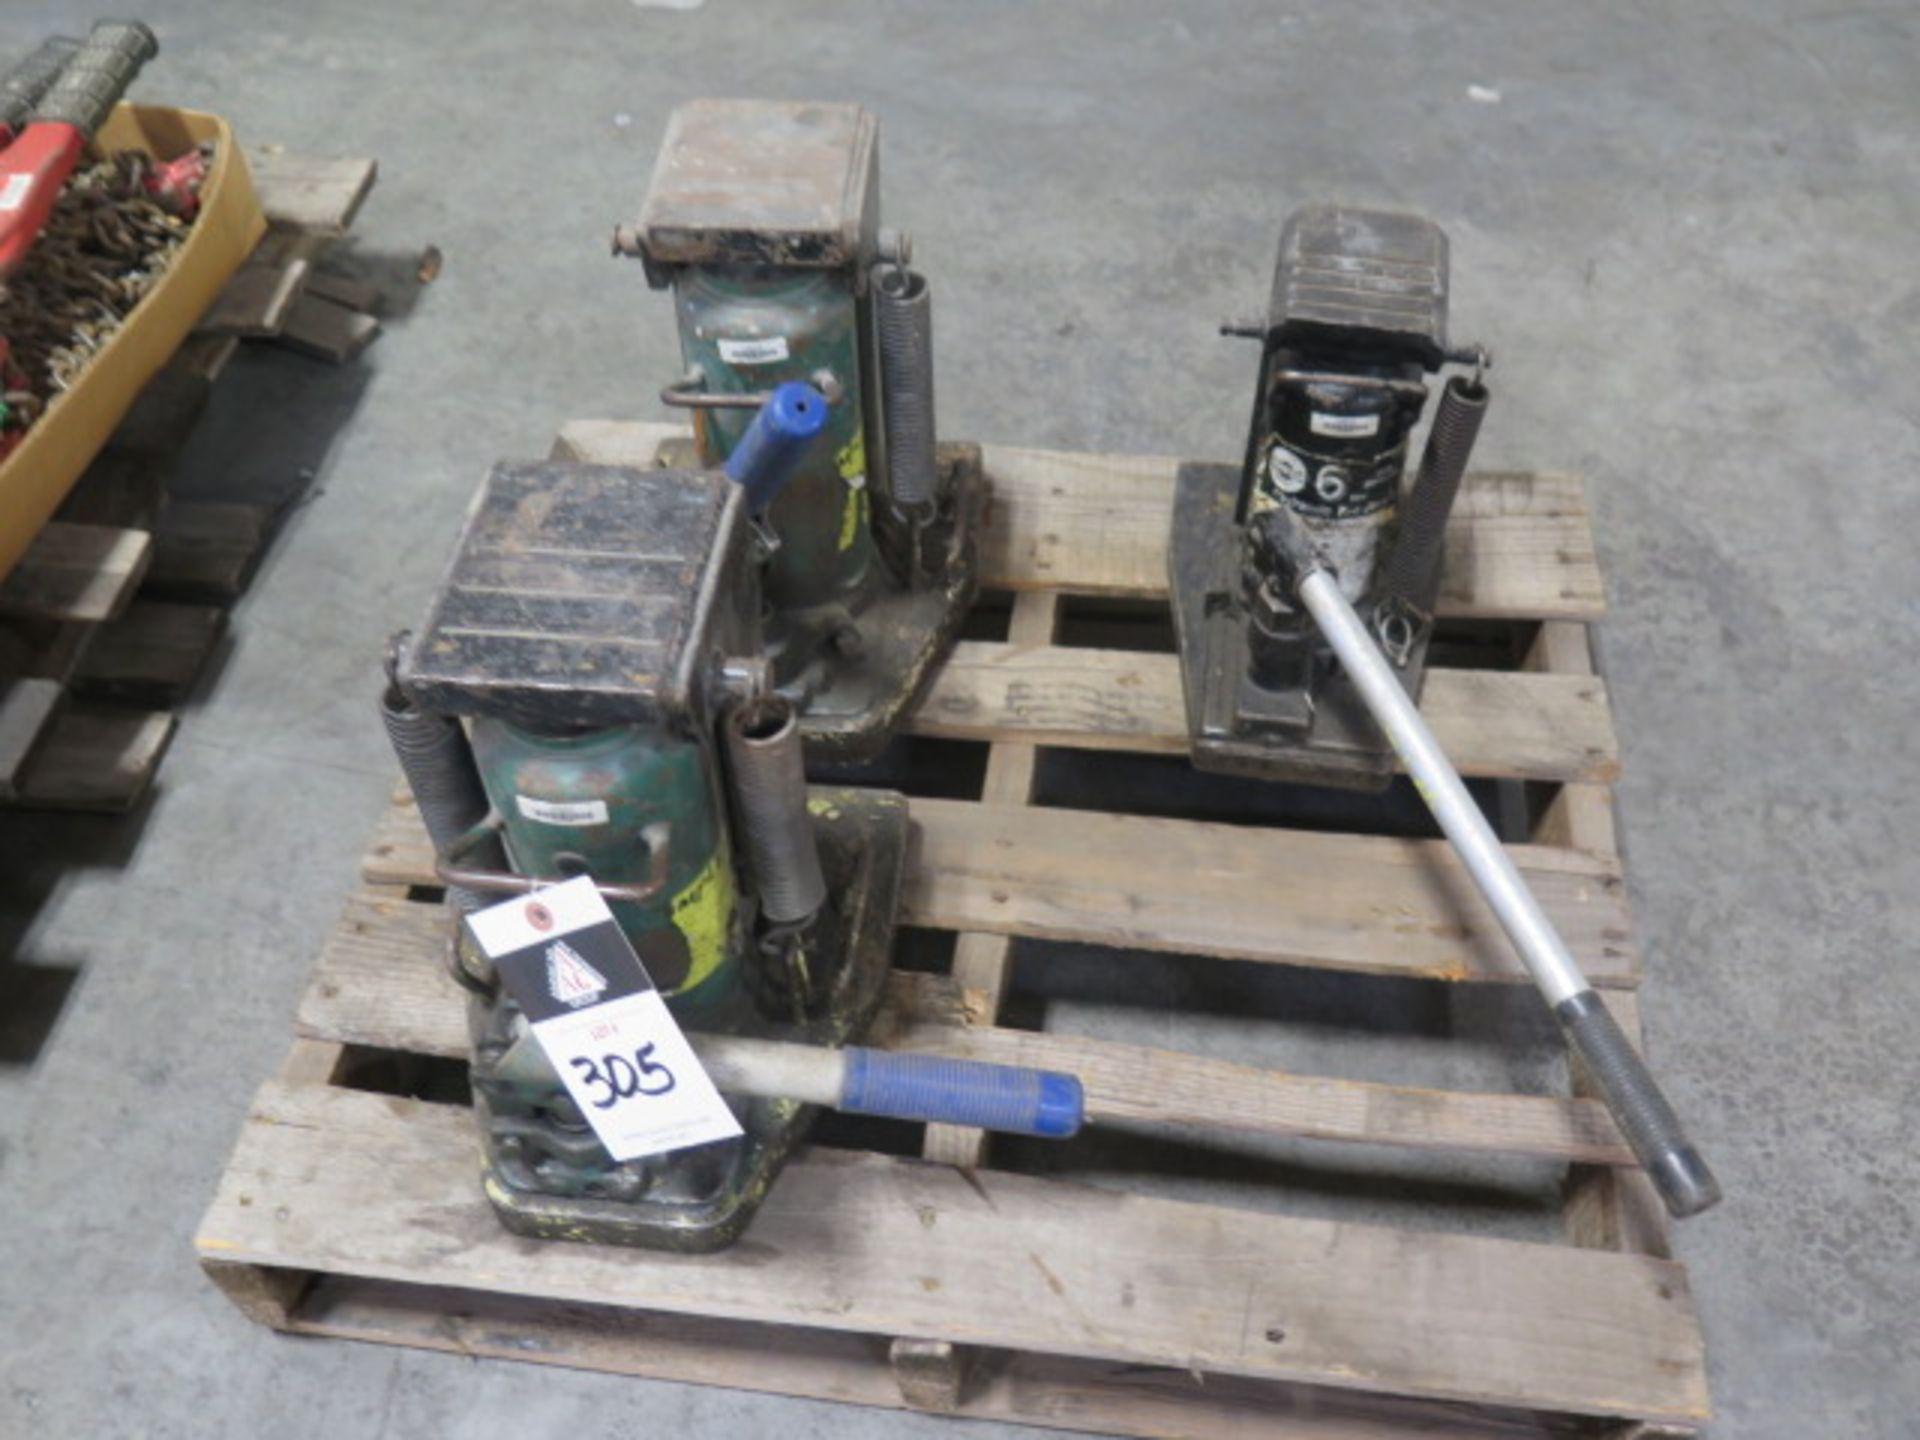 Simplex 10 Ton Hydrauic Machinery Jacks (2) and Omega 6 Ton Hydraulic Machinery Jack (SOLD AS-IS -